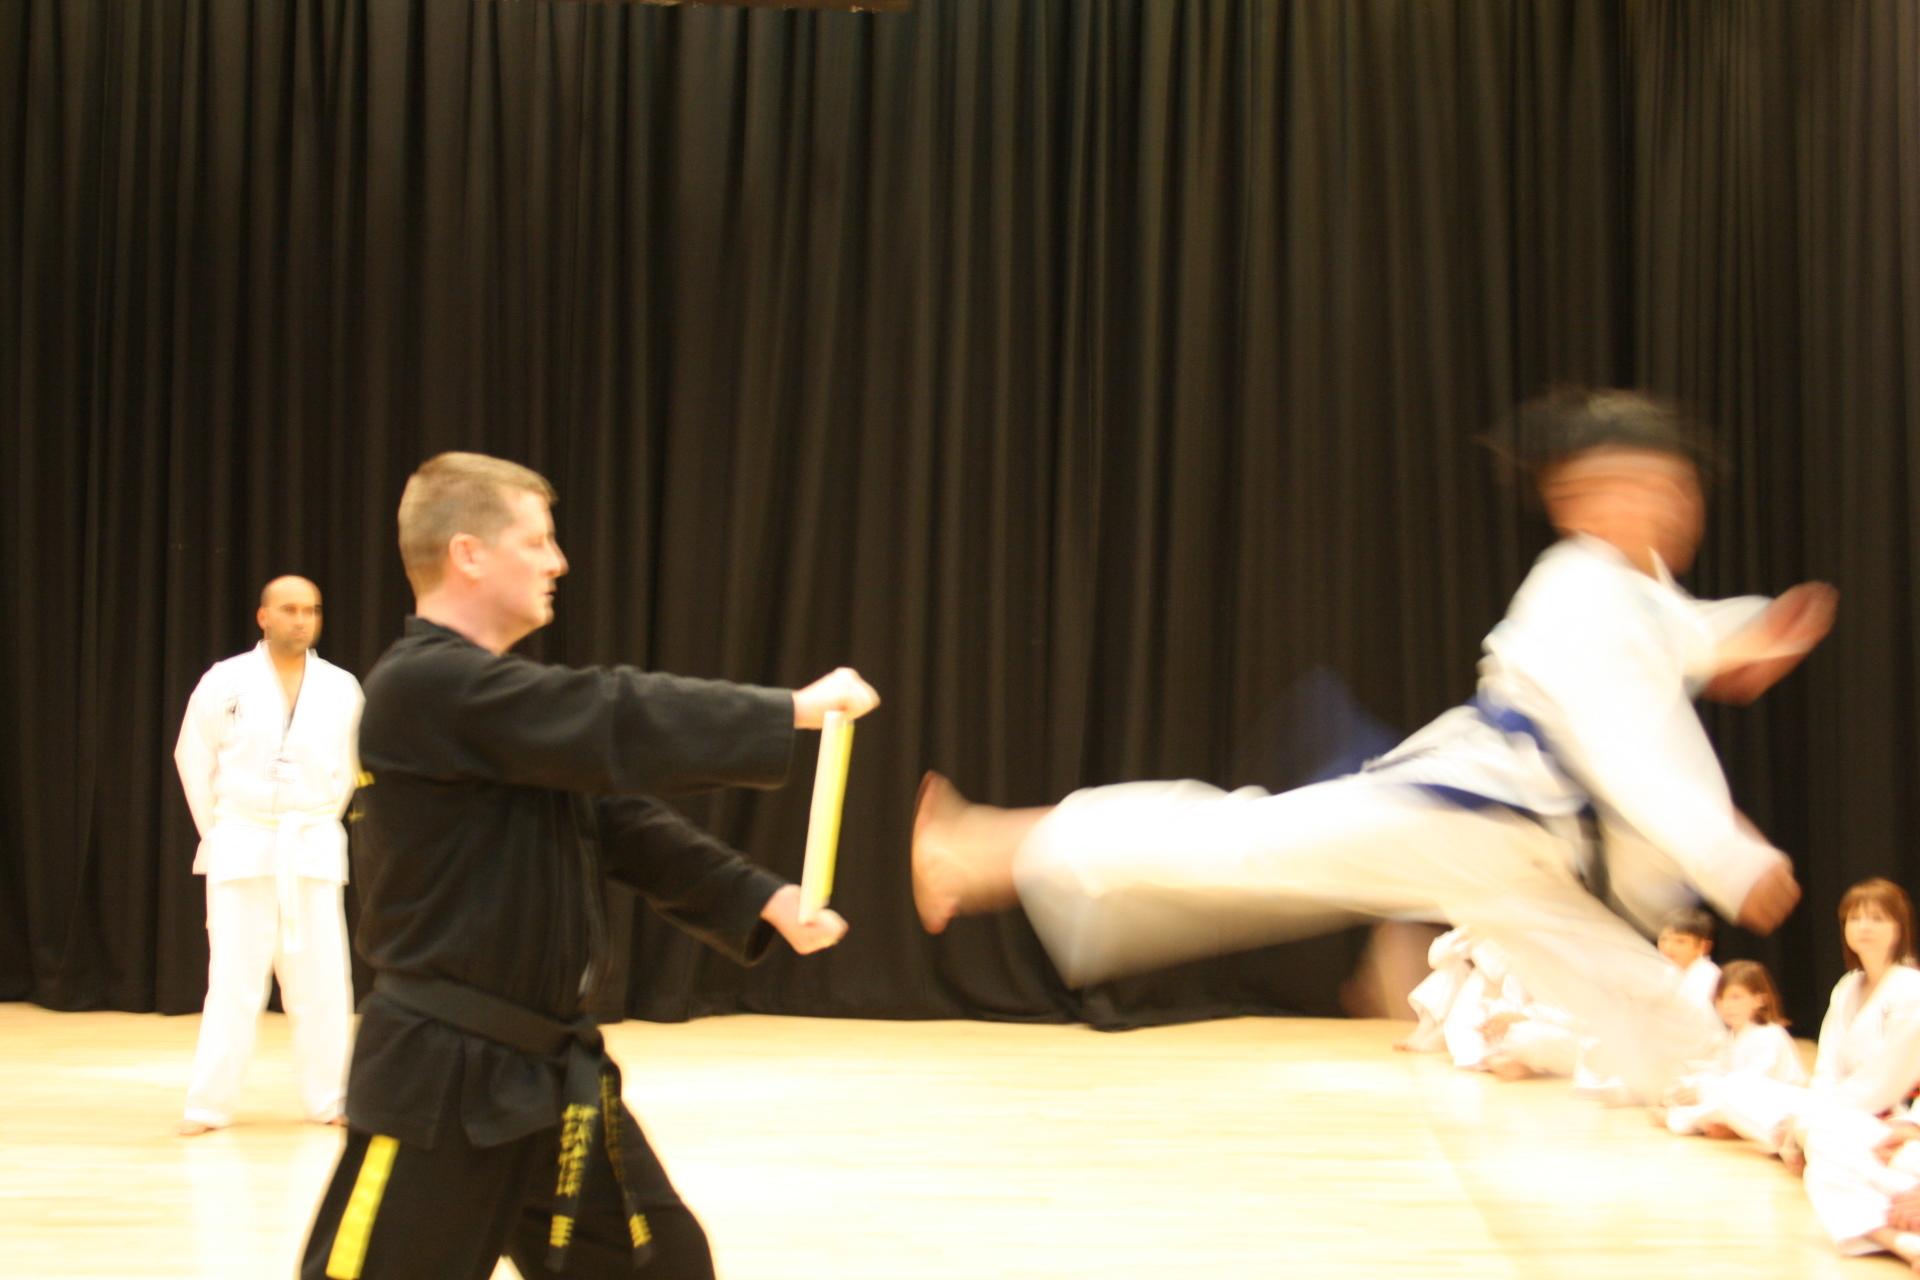 Student Jump Side Kick